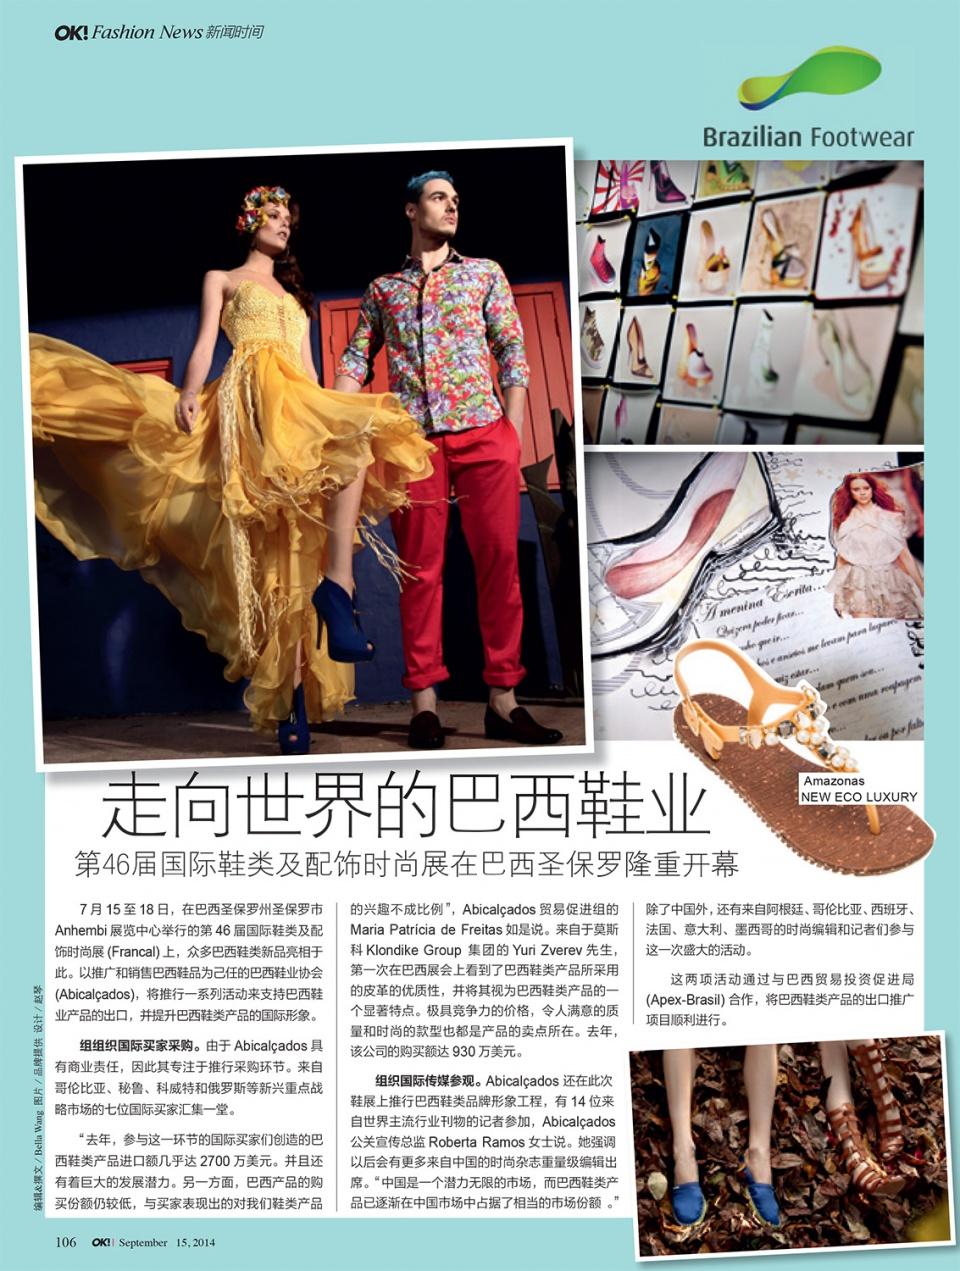 Fashion News - CHINA